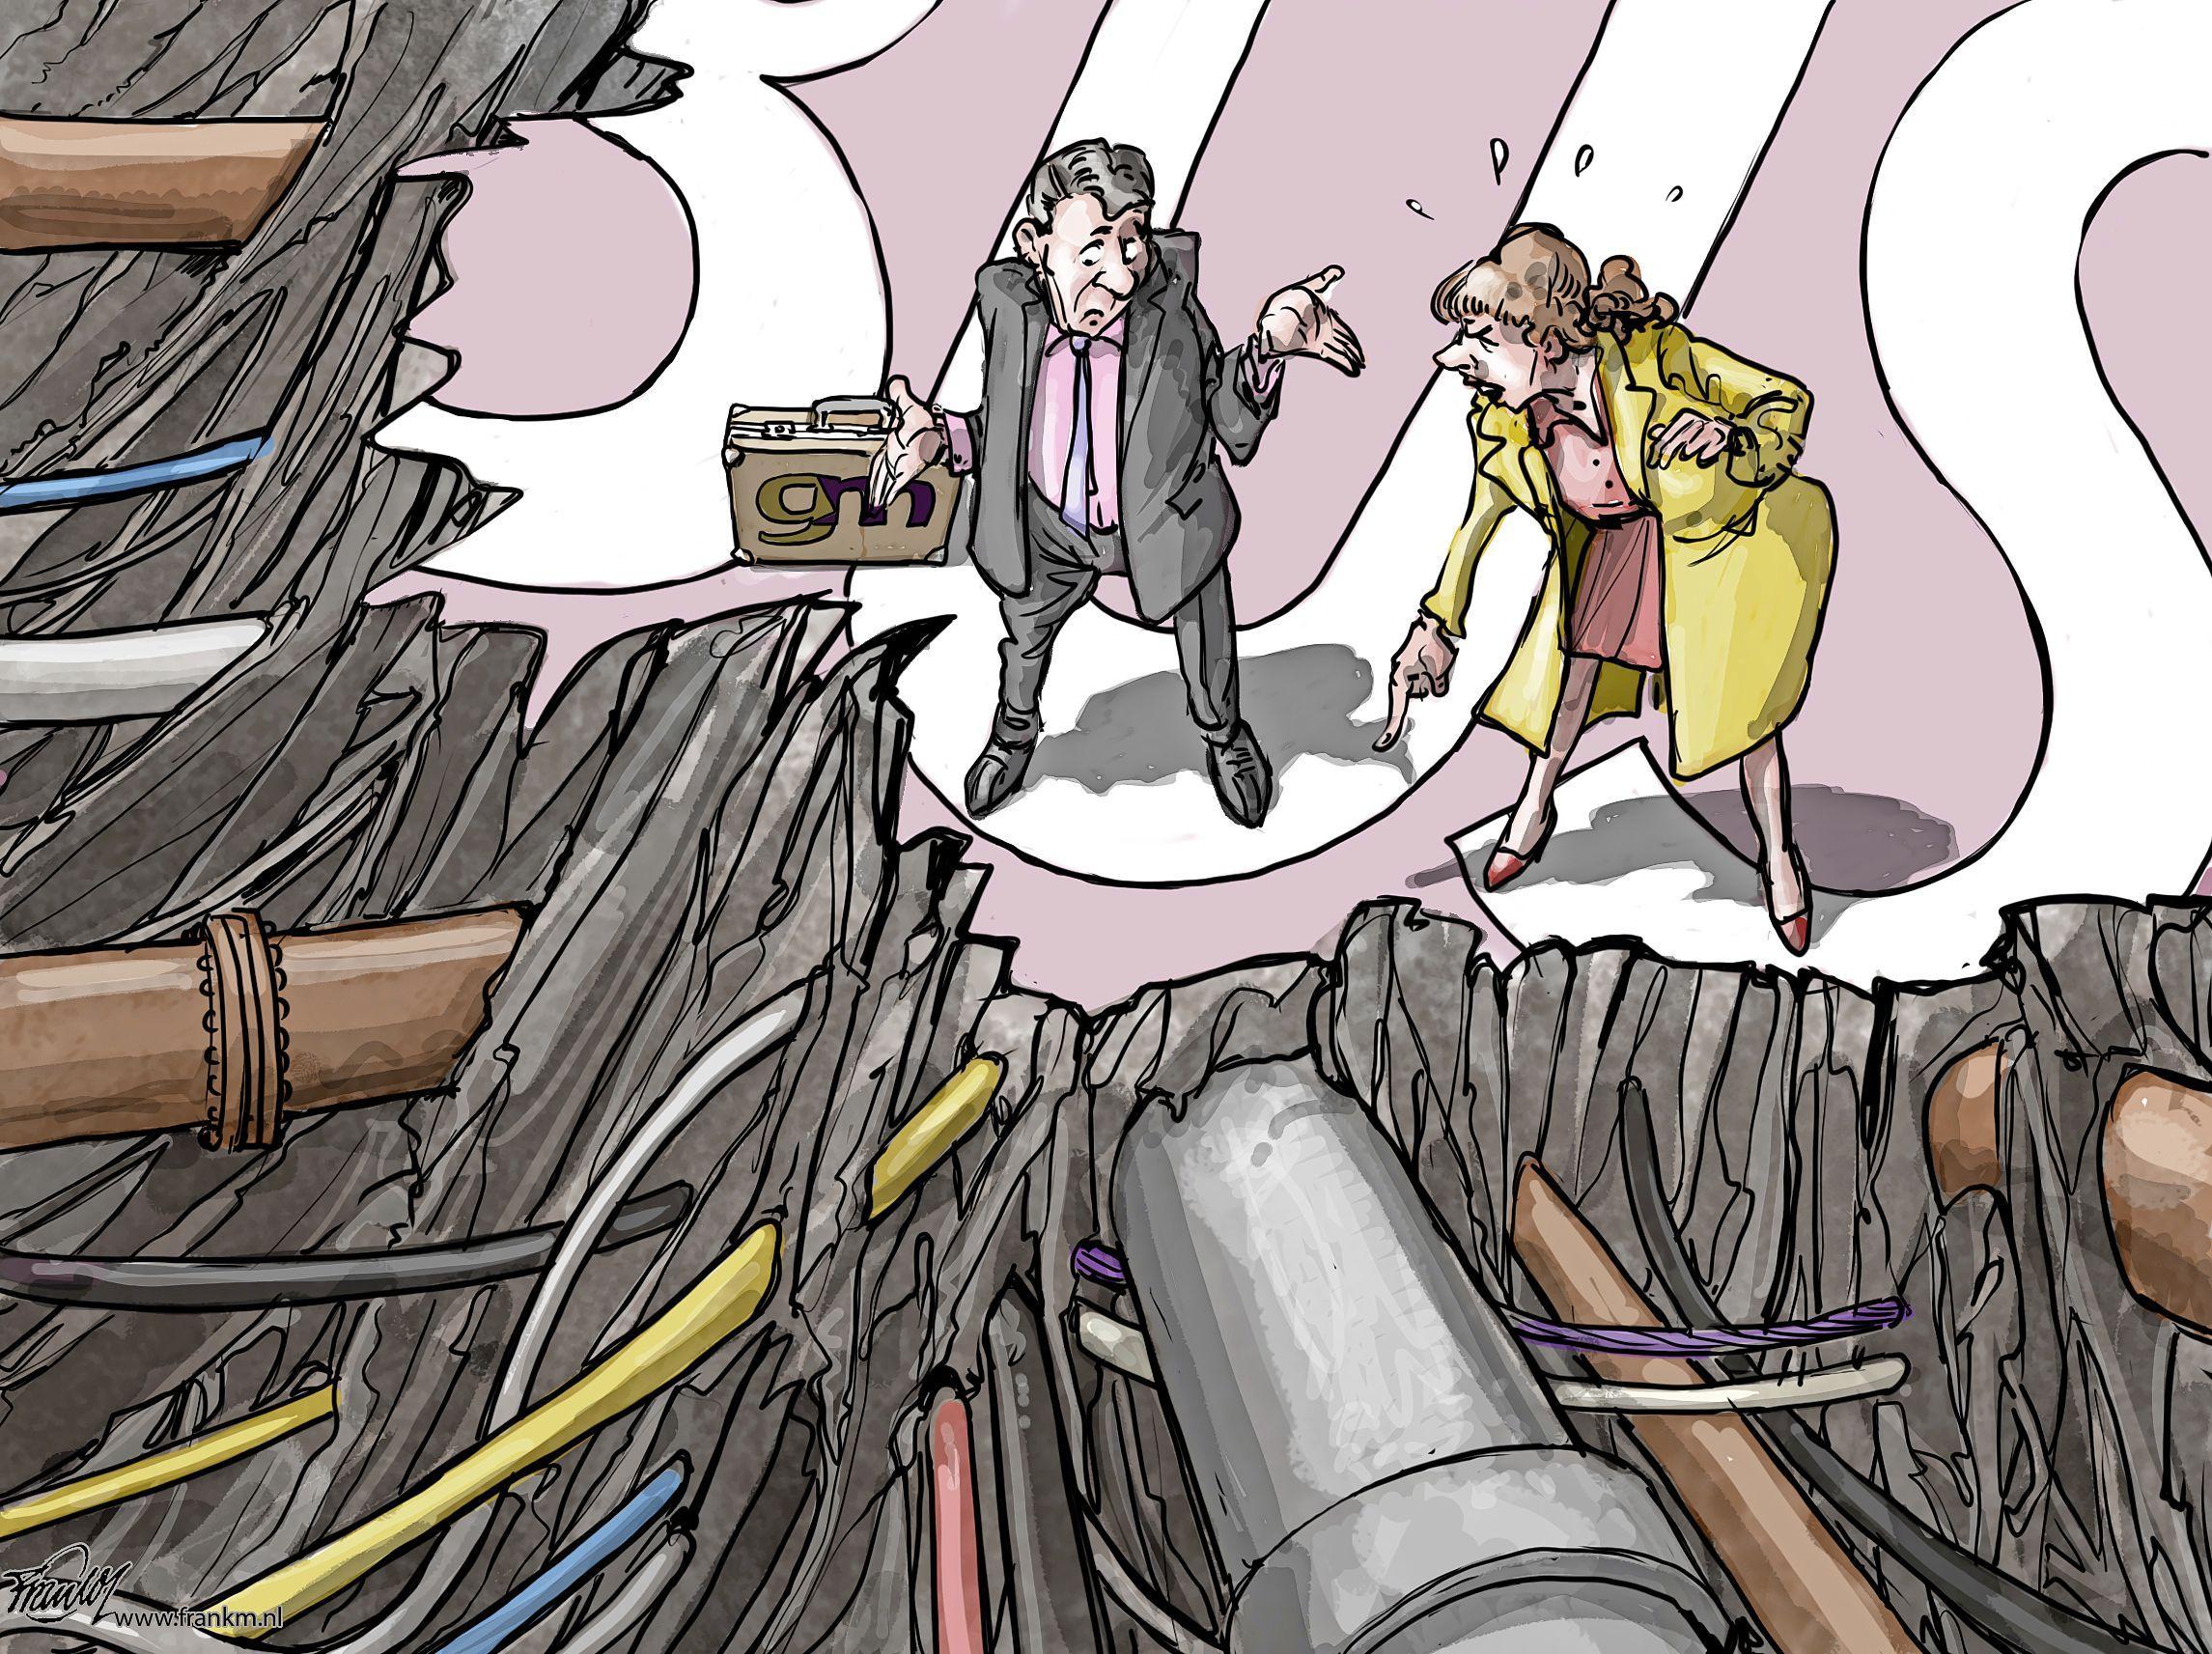 De geheime ondergrondse wereld in Bussum | cartoon Frank Muntjewerf